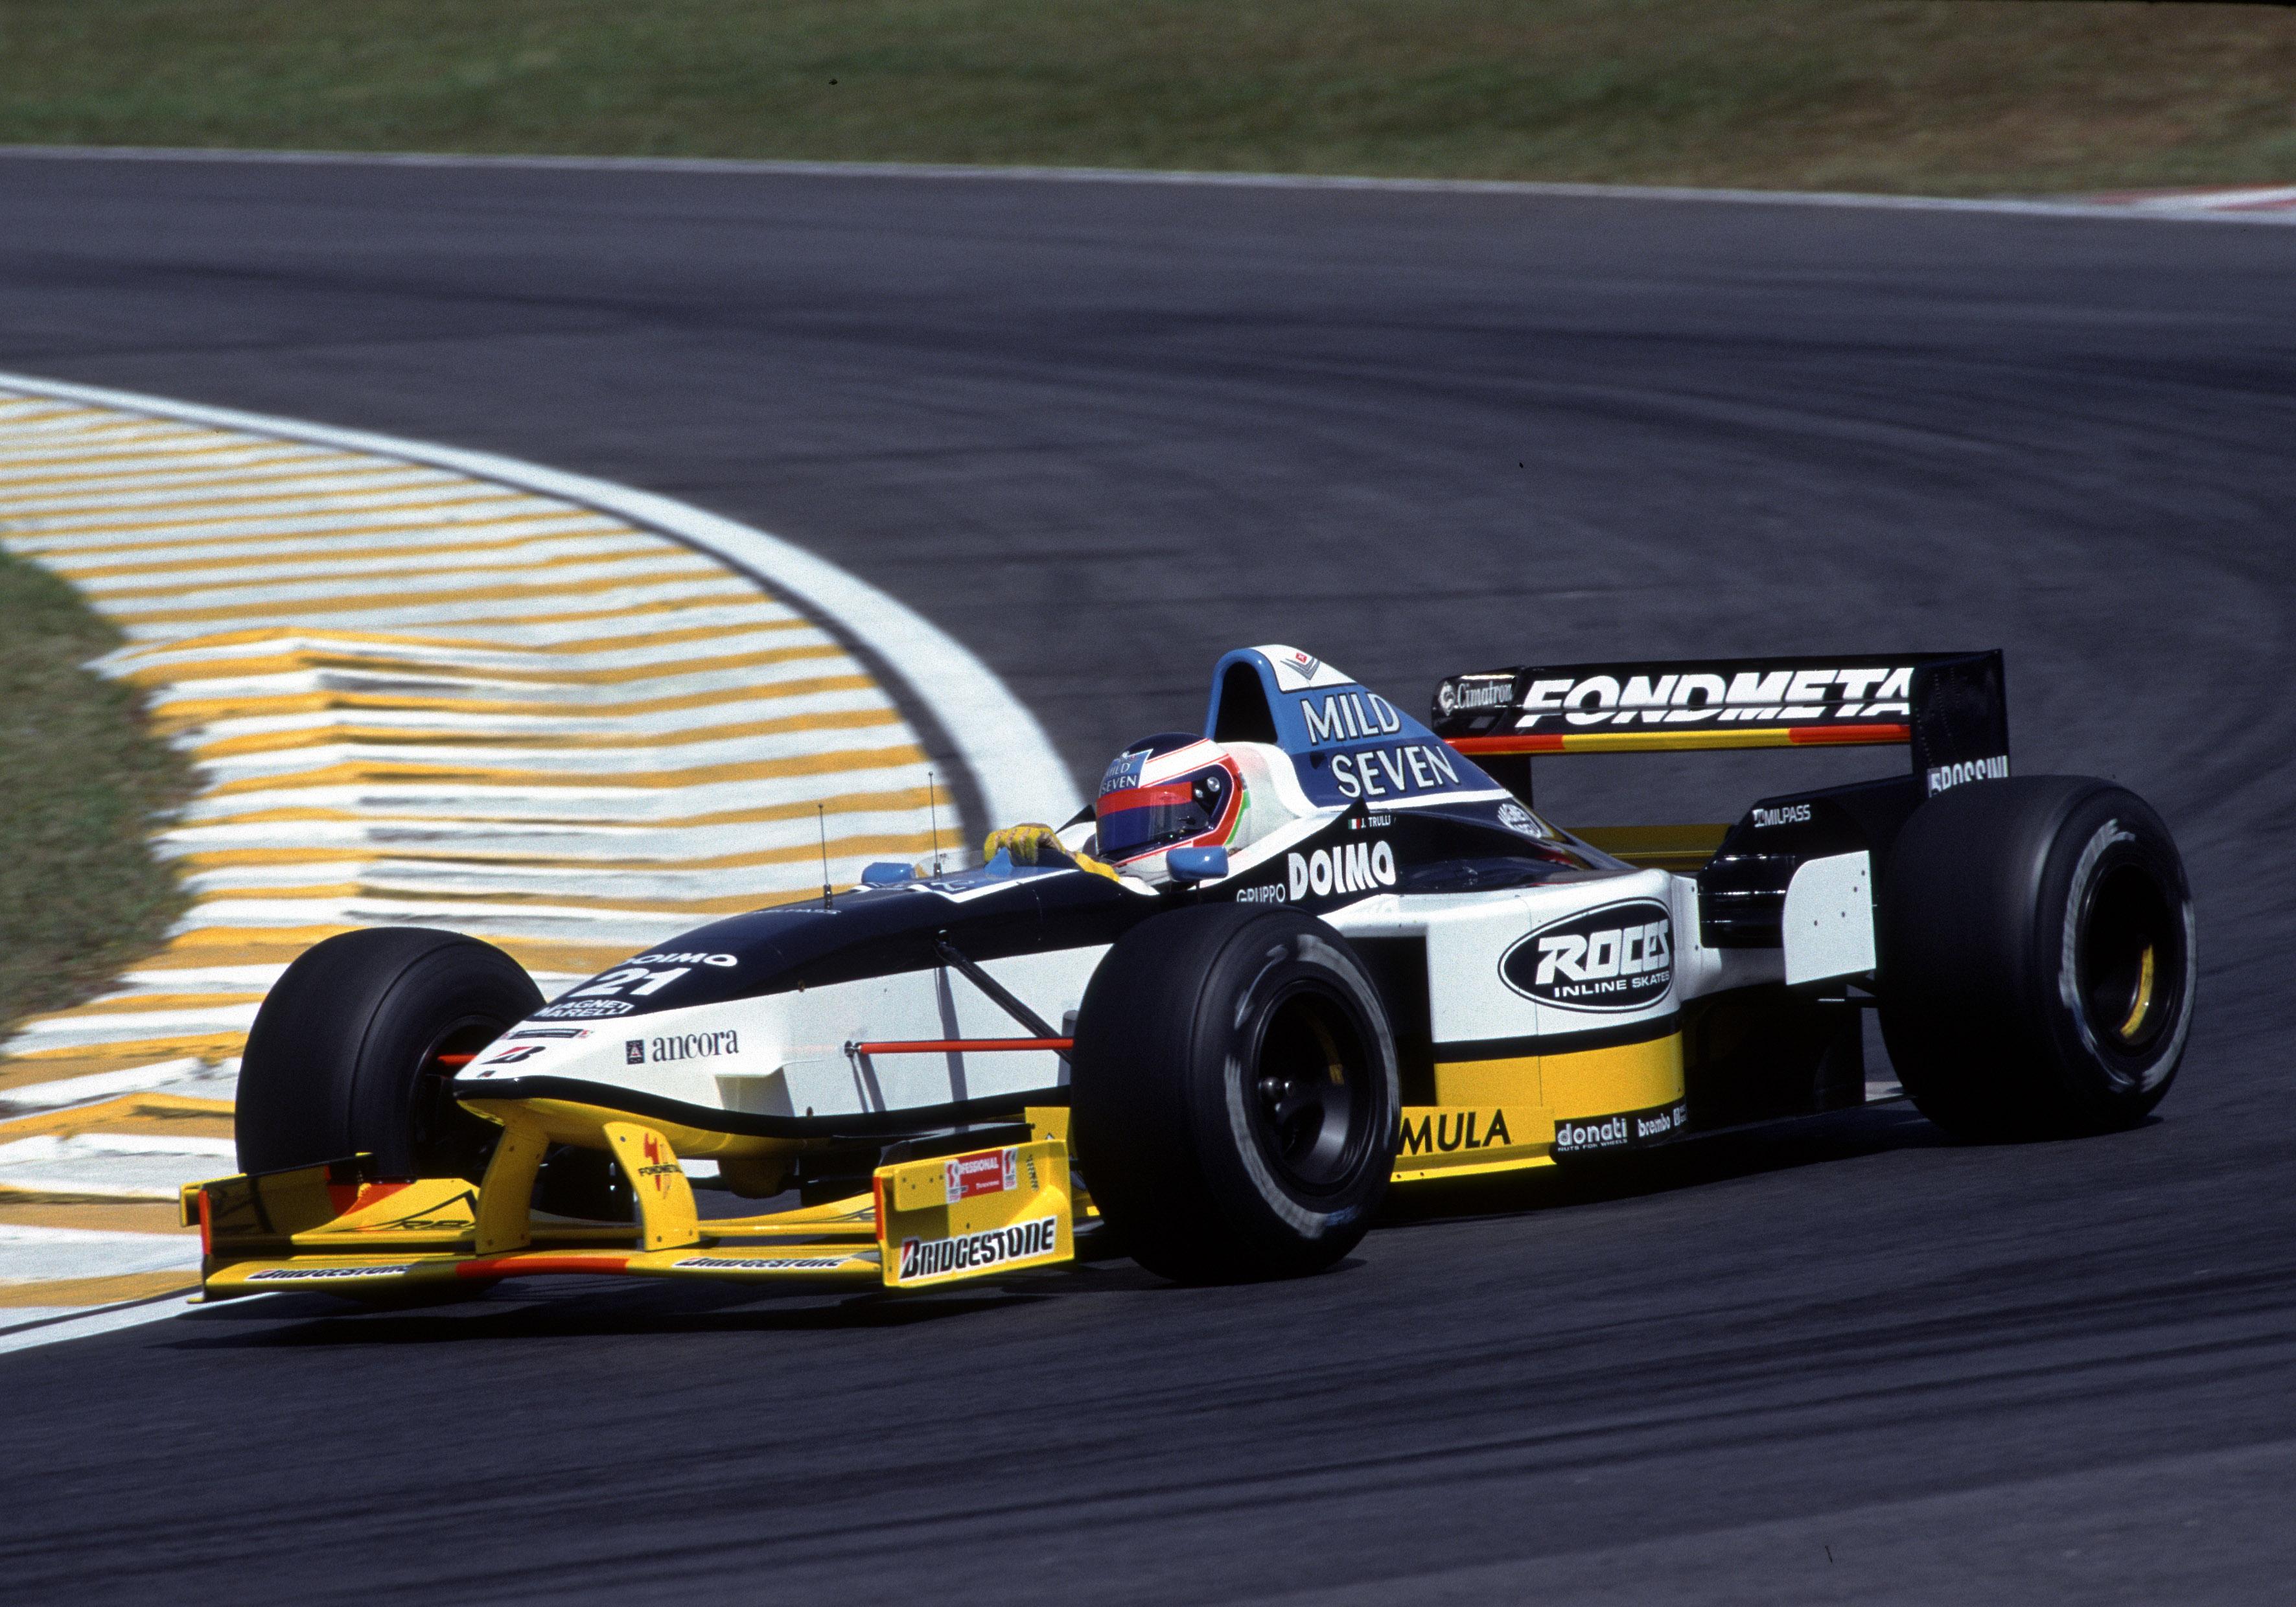 Brazilian Grand Prix Interlagos (bra) 28 30 3 1997